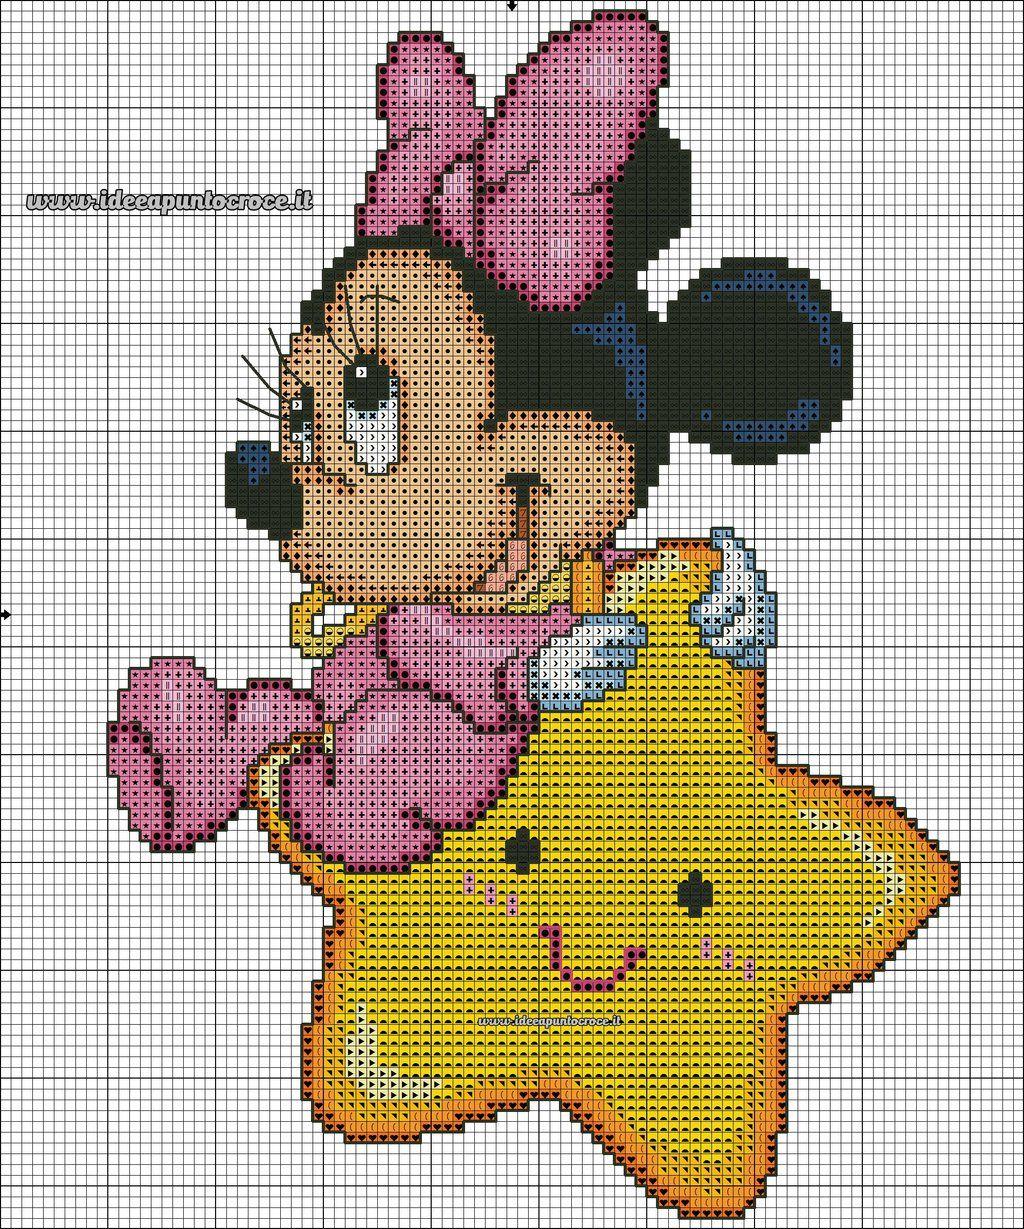 Baby Minnie Punto Croce By Syra1974 On Deviantart Cartoon Cross